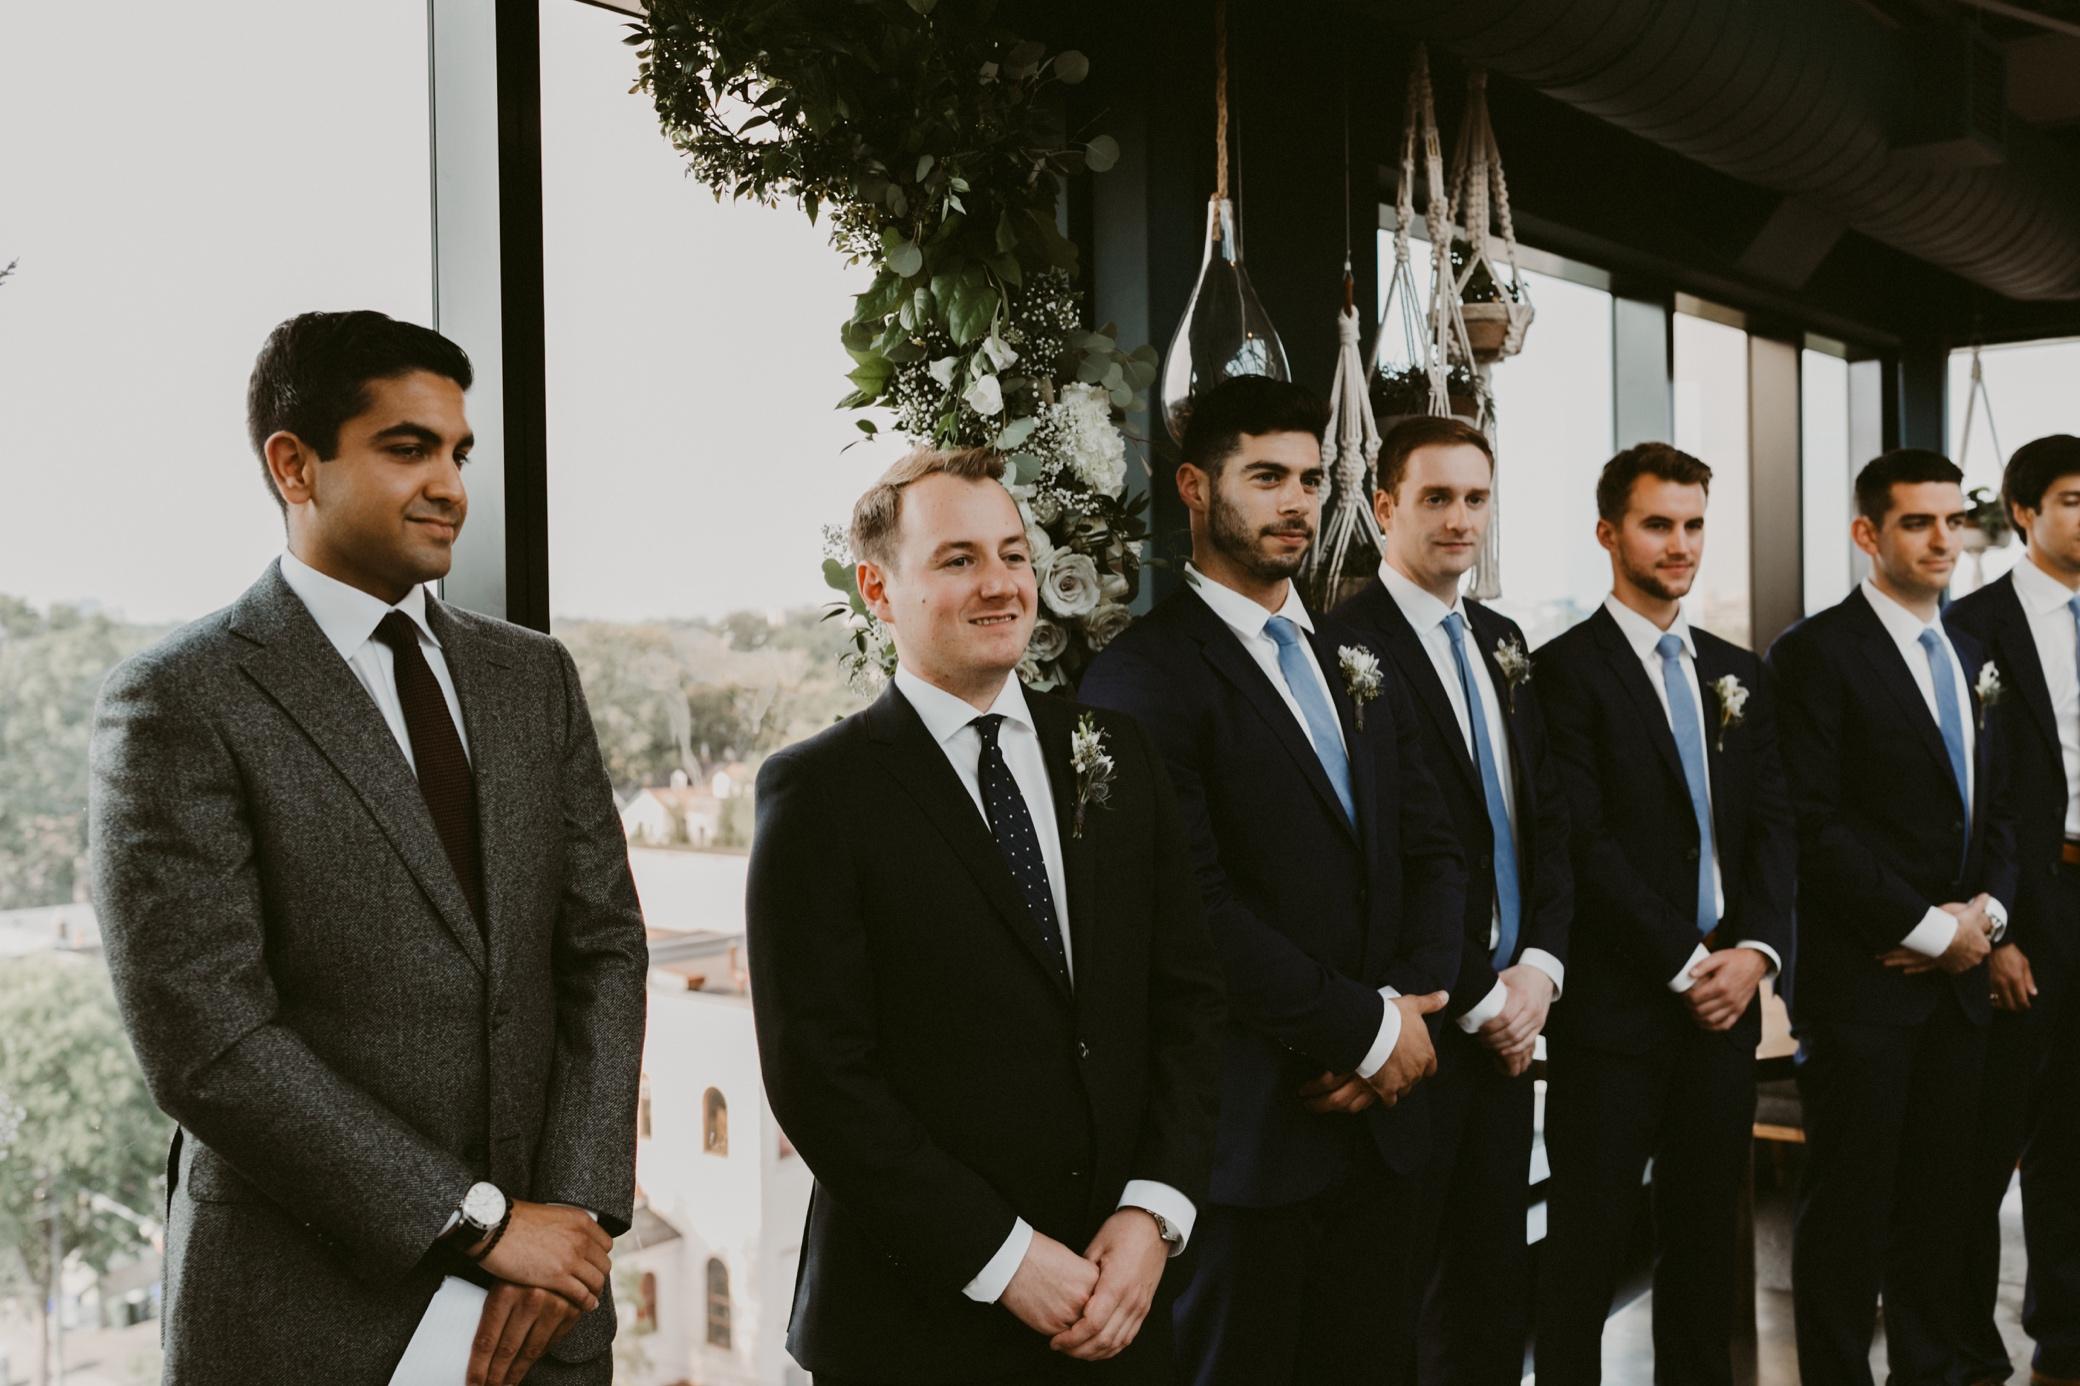 059_The Broadview Hotel Wedding (413 of 913).jpg